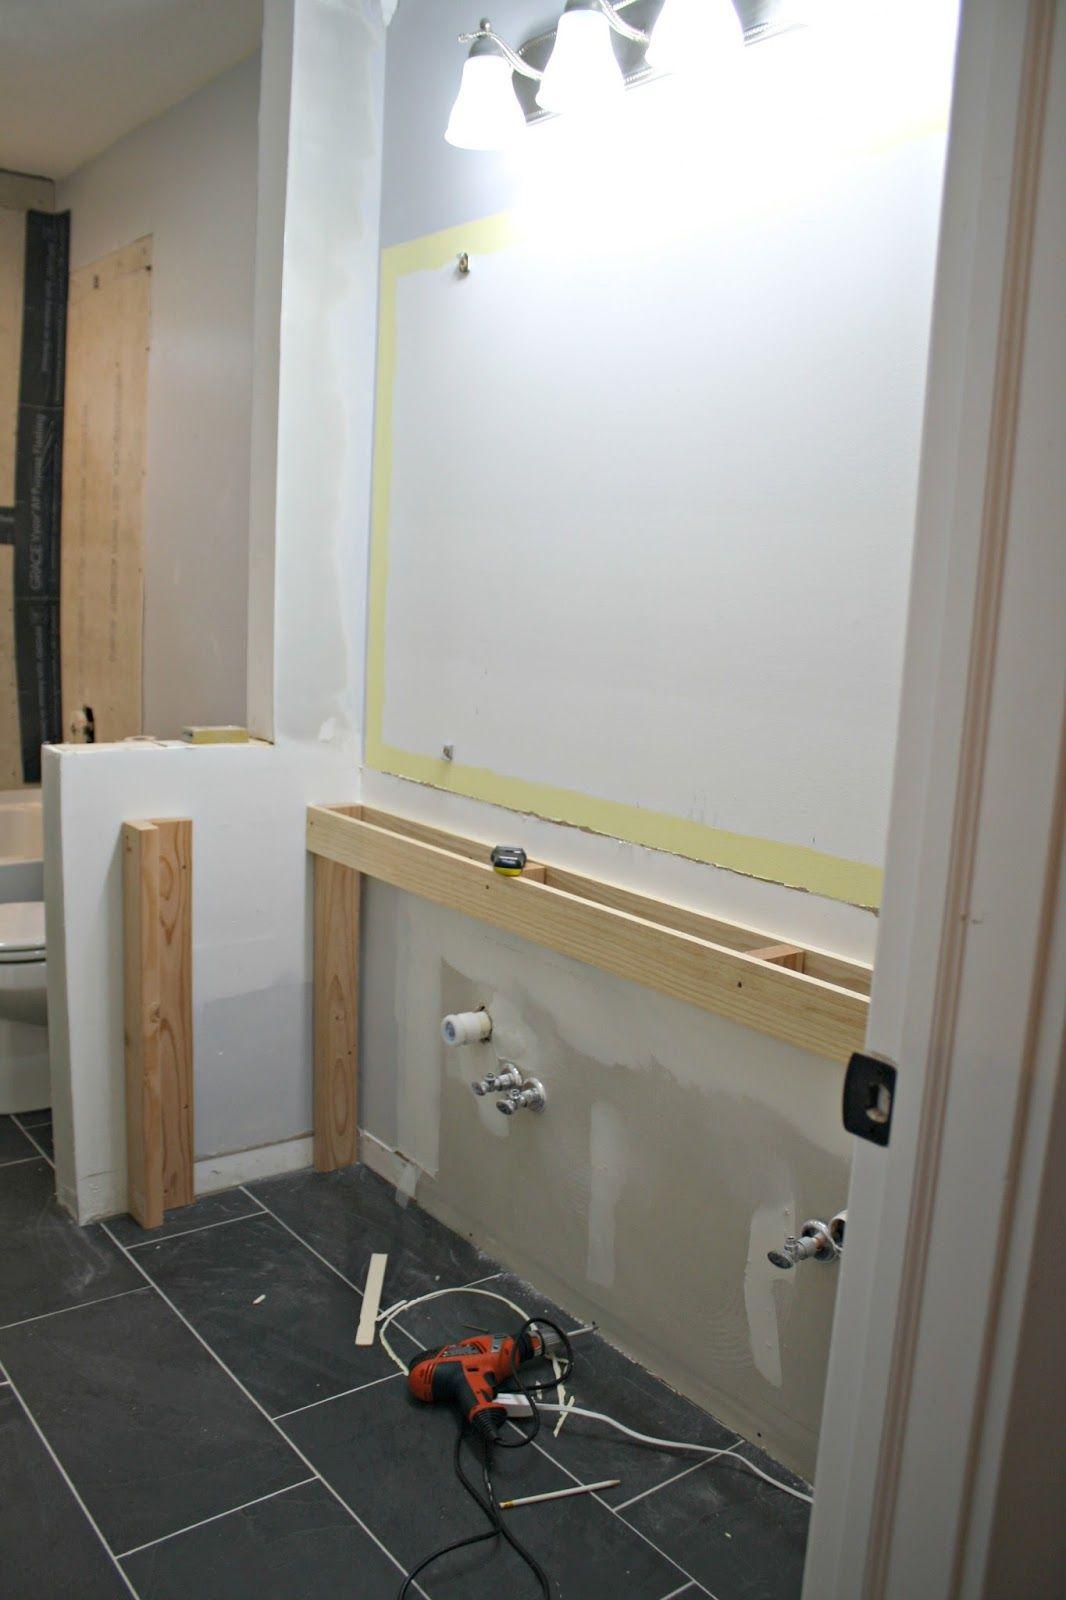 Amazing Build Your Own Bathroom Vanity Plans Online Bathroom - Build your own bathroom vanity plans